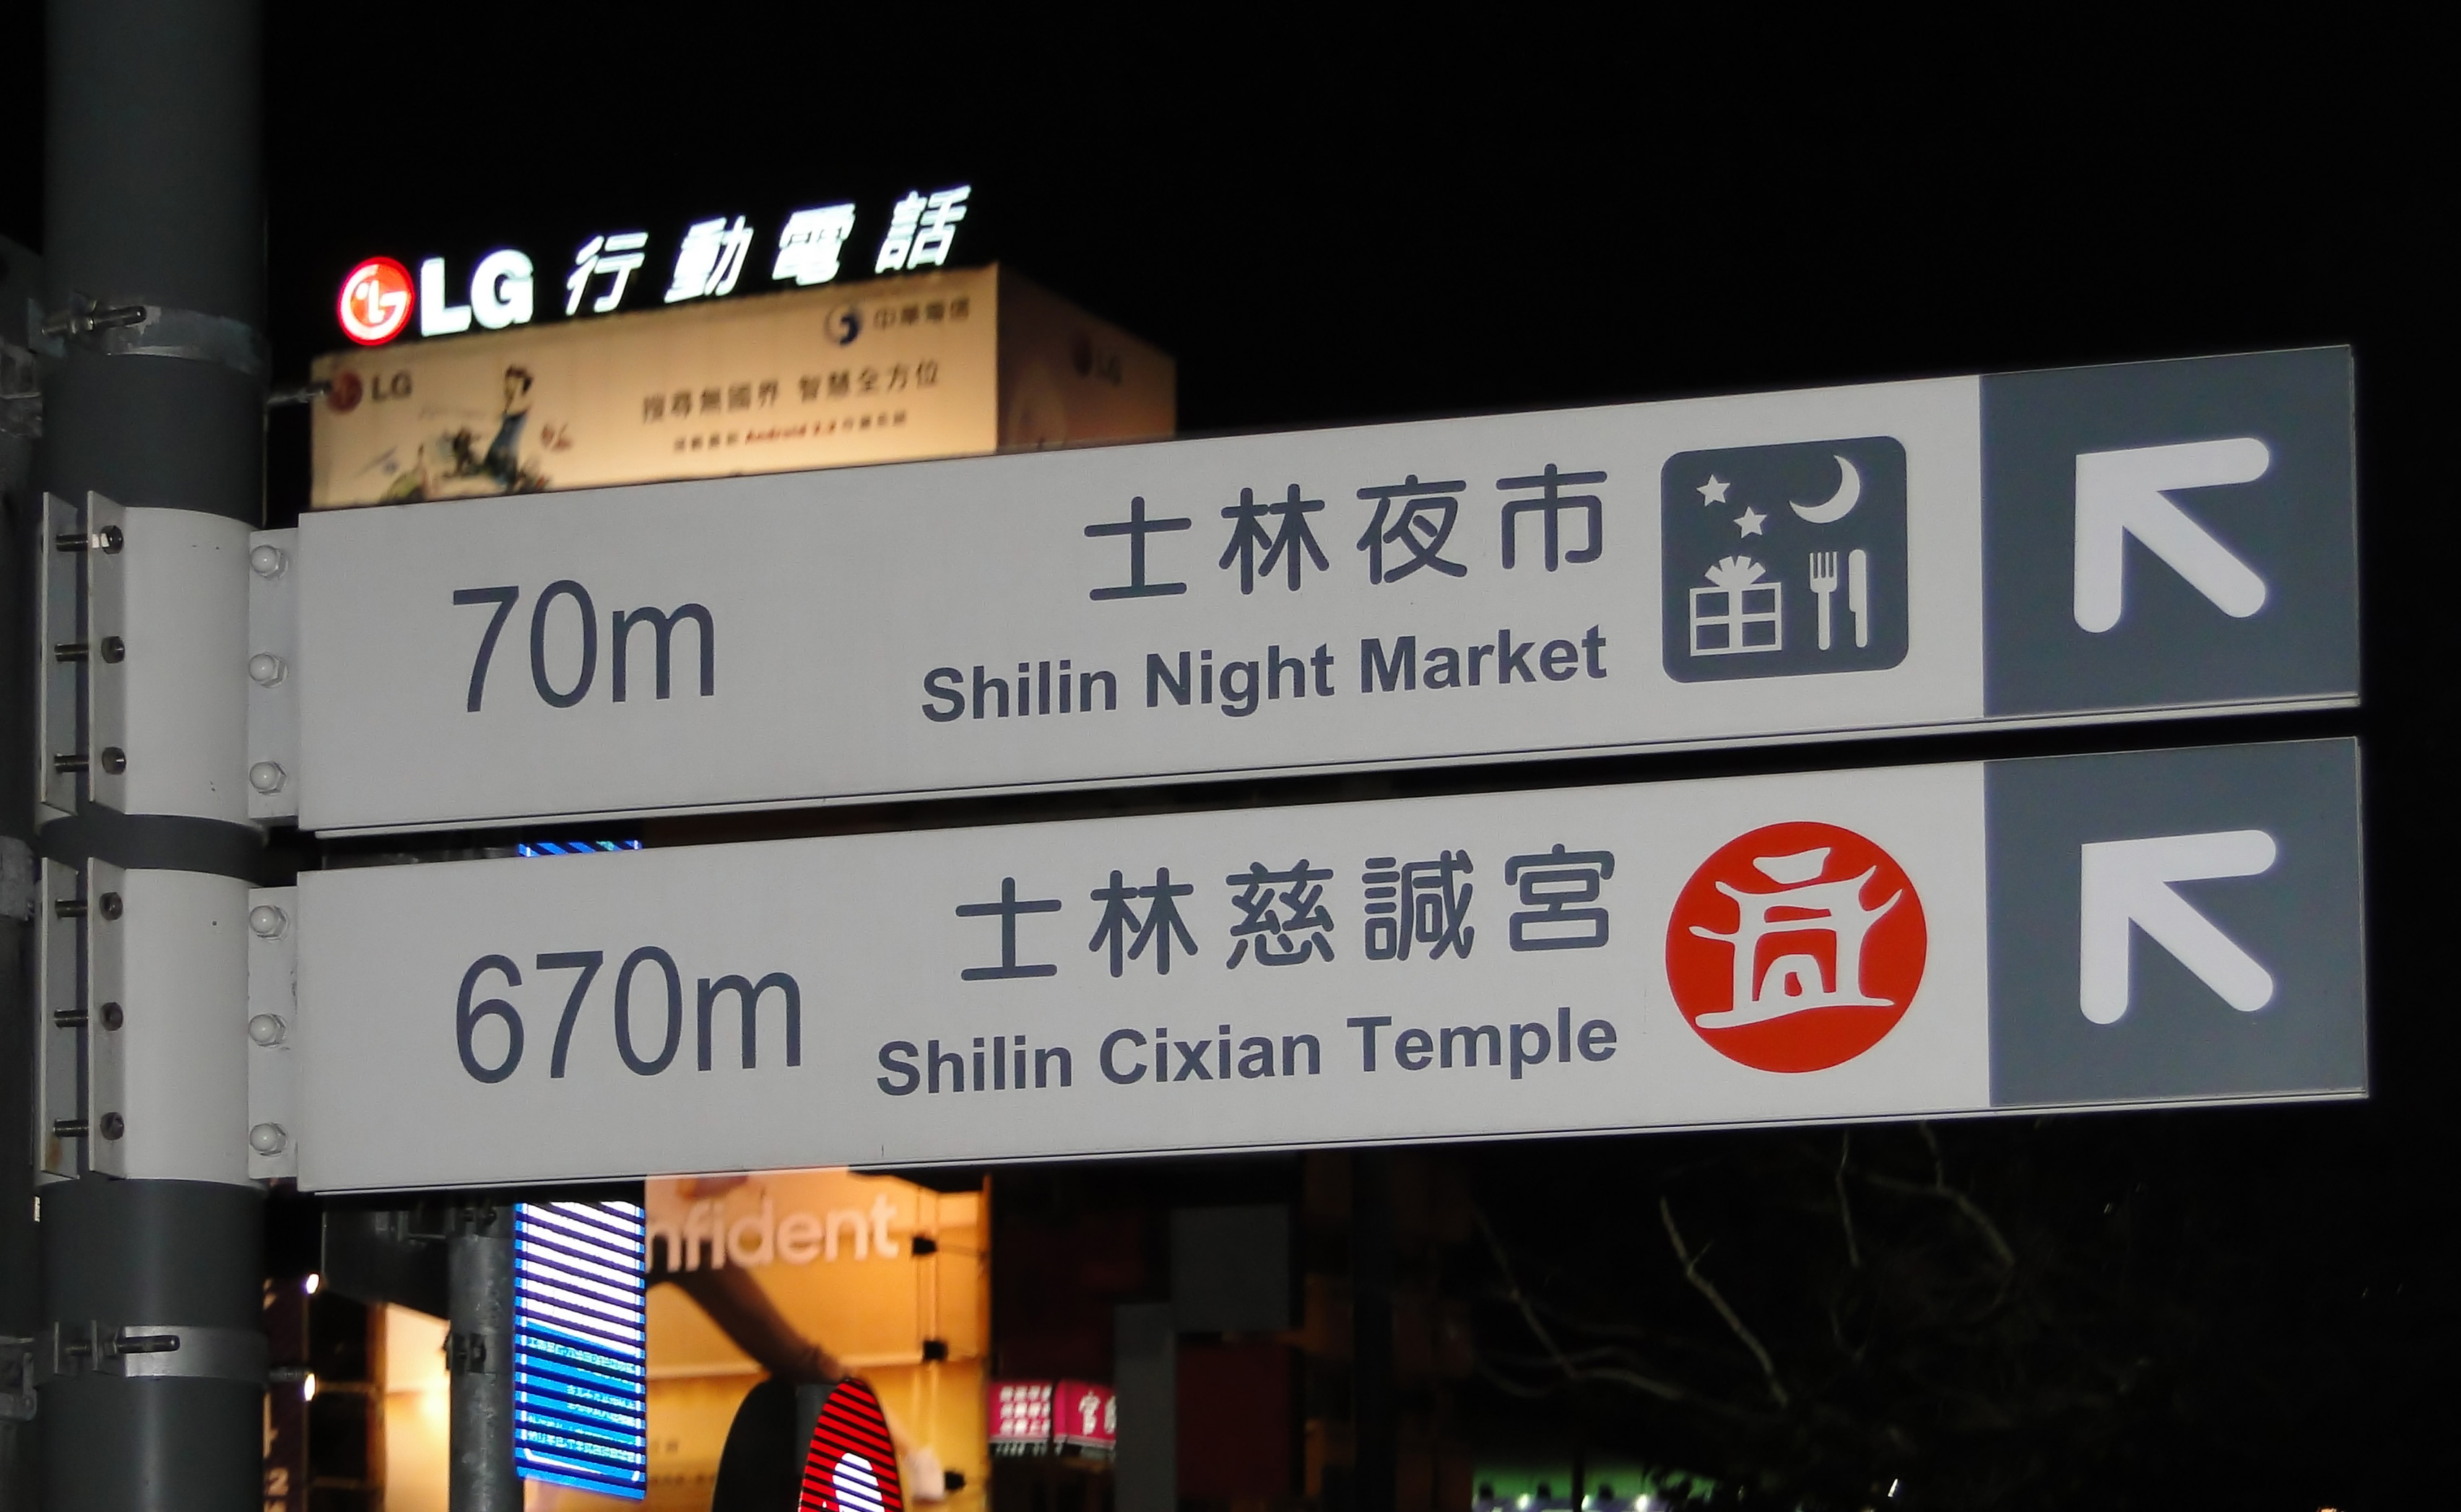 Shilin Night Market and Shilin Cixian Temple directional signs 20110313 night.jpg